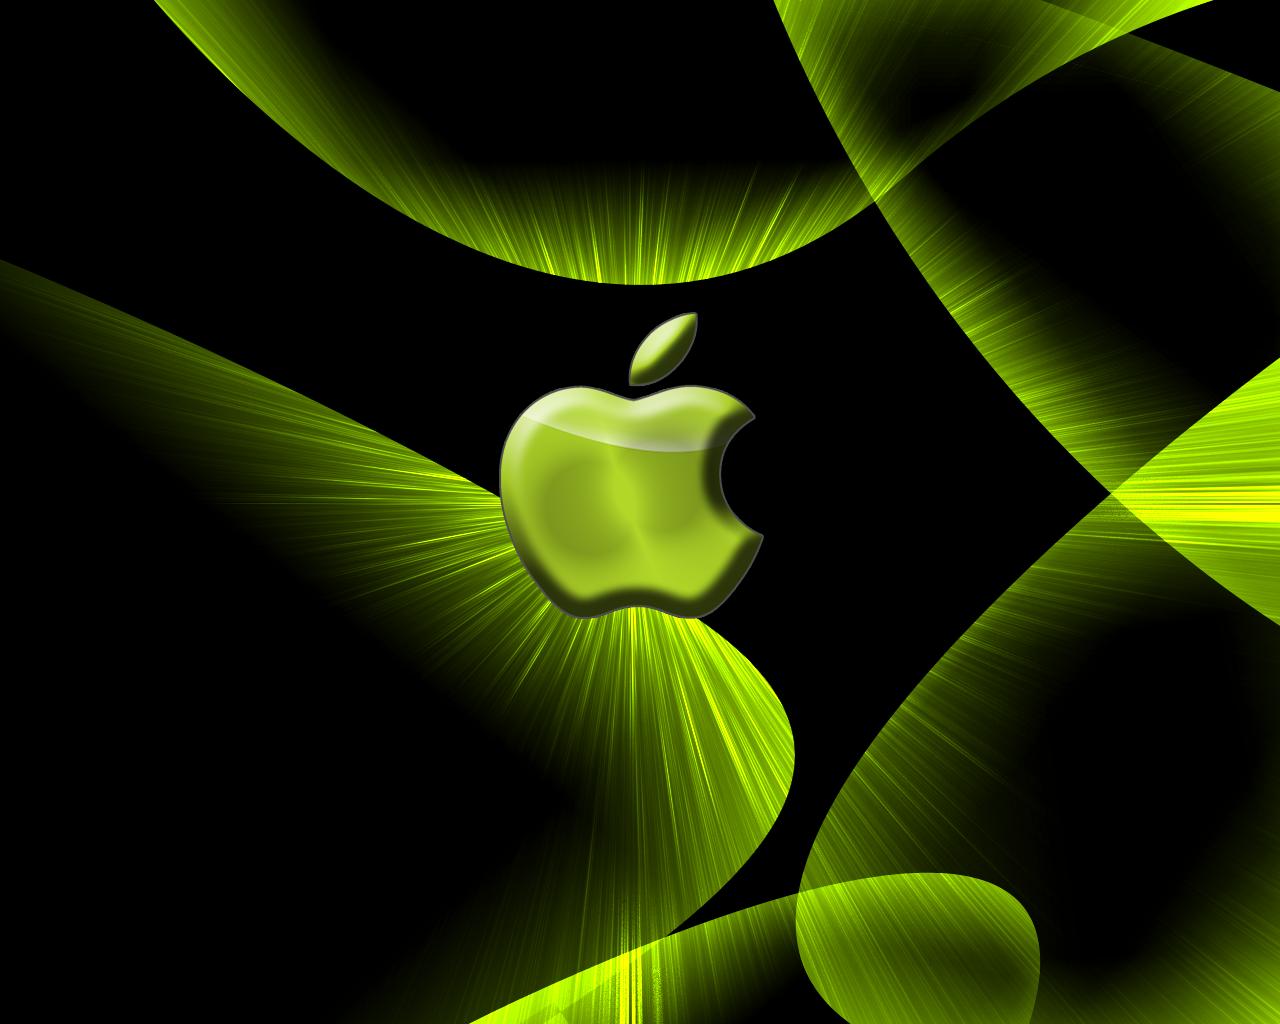 Black aqua wallpaper w. apple by Innercityghettozone